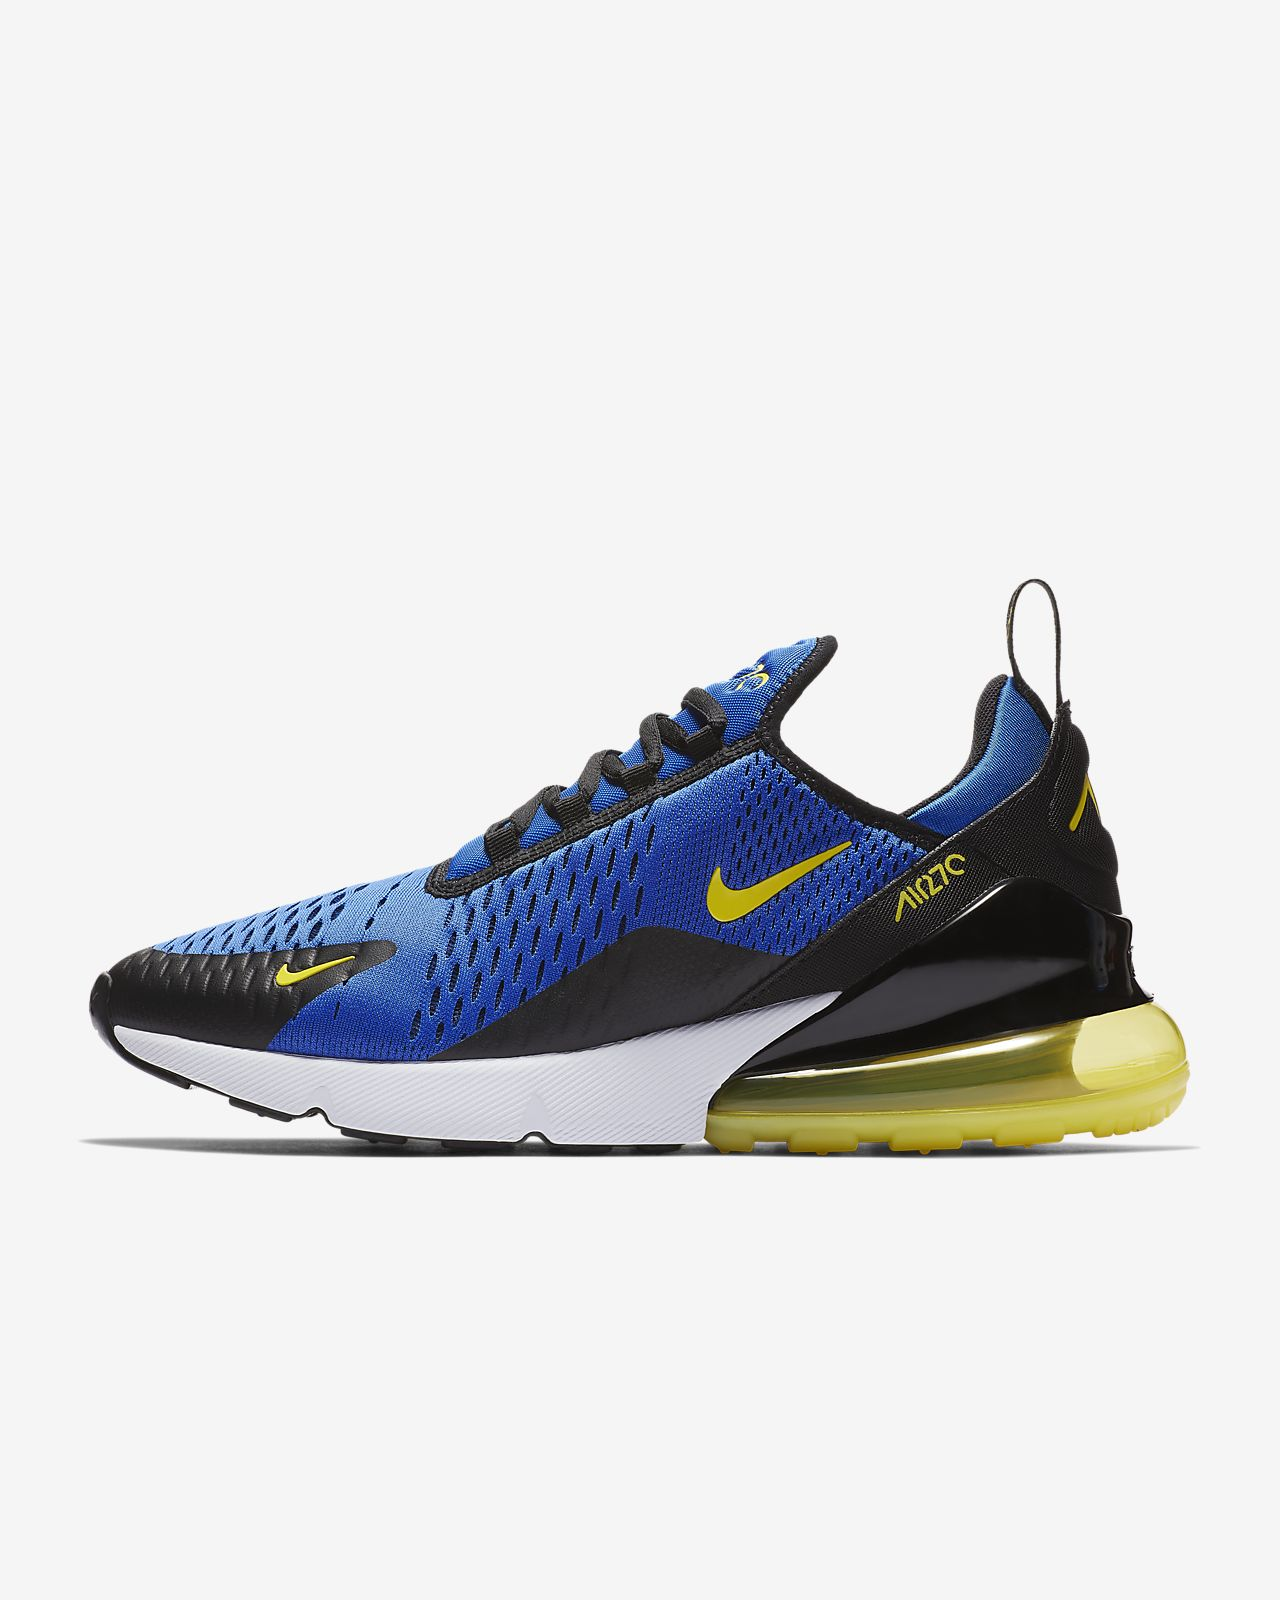 cheaper 70cd7 8ec17 Nike Air Max 270